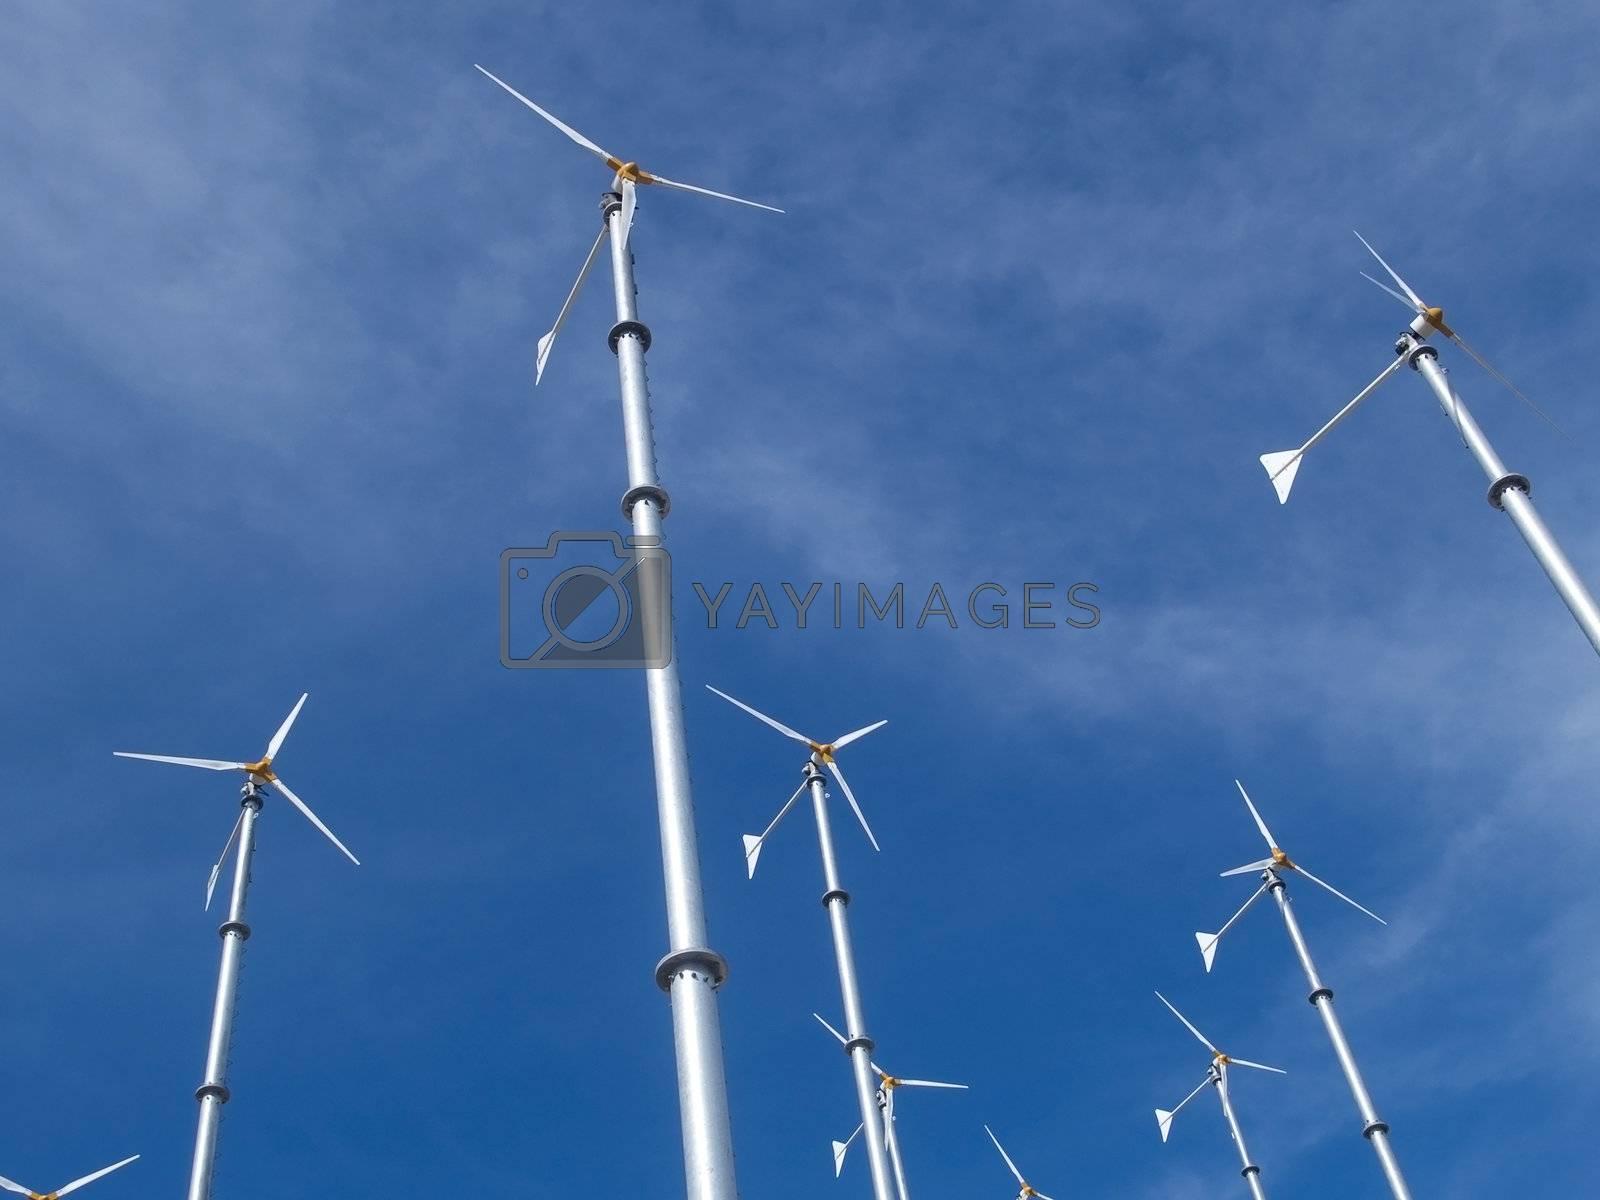 Windmill park by epixx